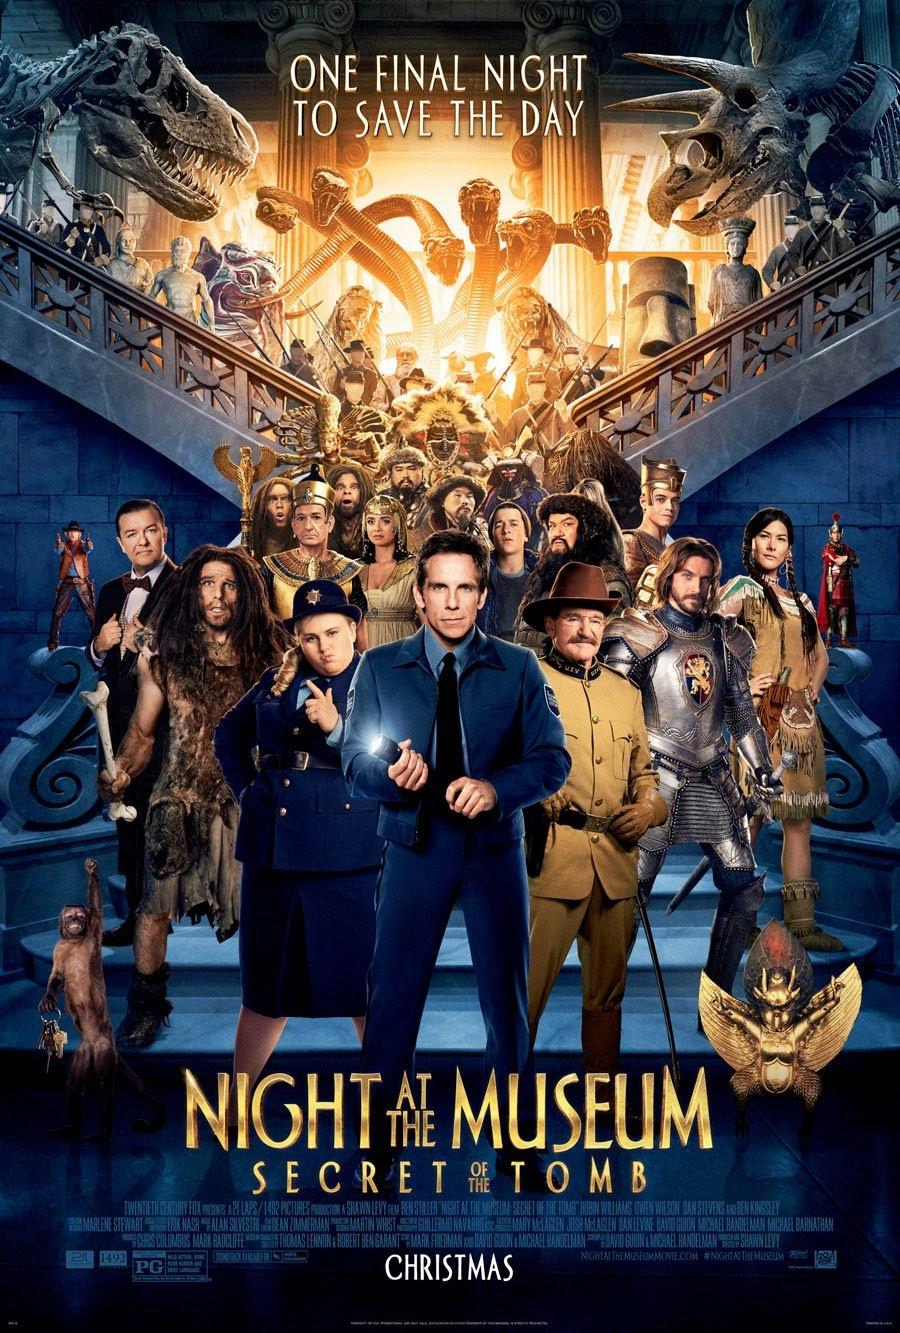 Night at the Museum 3 Secret of the Tomb (2014) ไนท์ แอท เดอะ มิวเซียม ความลับสุสานอัศจรรย์ [HD]